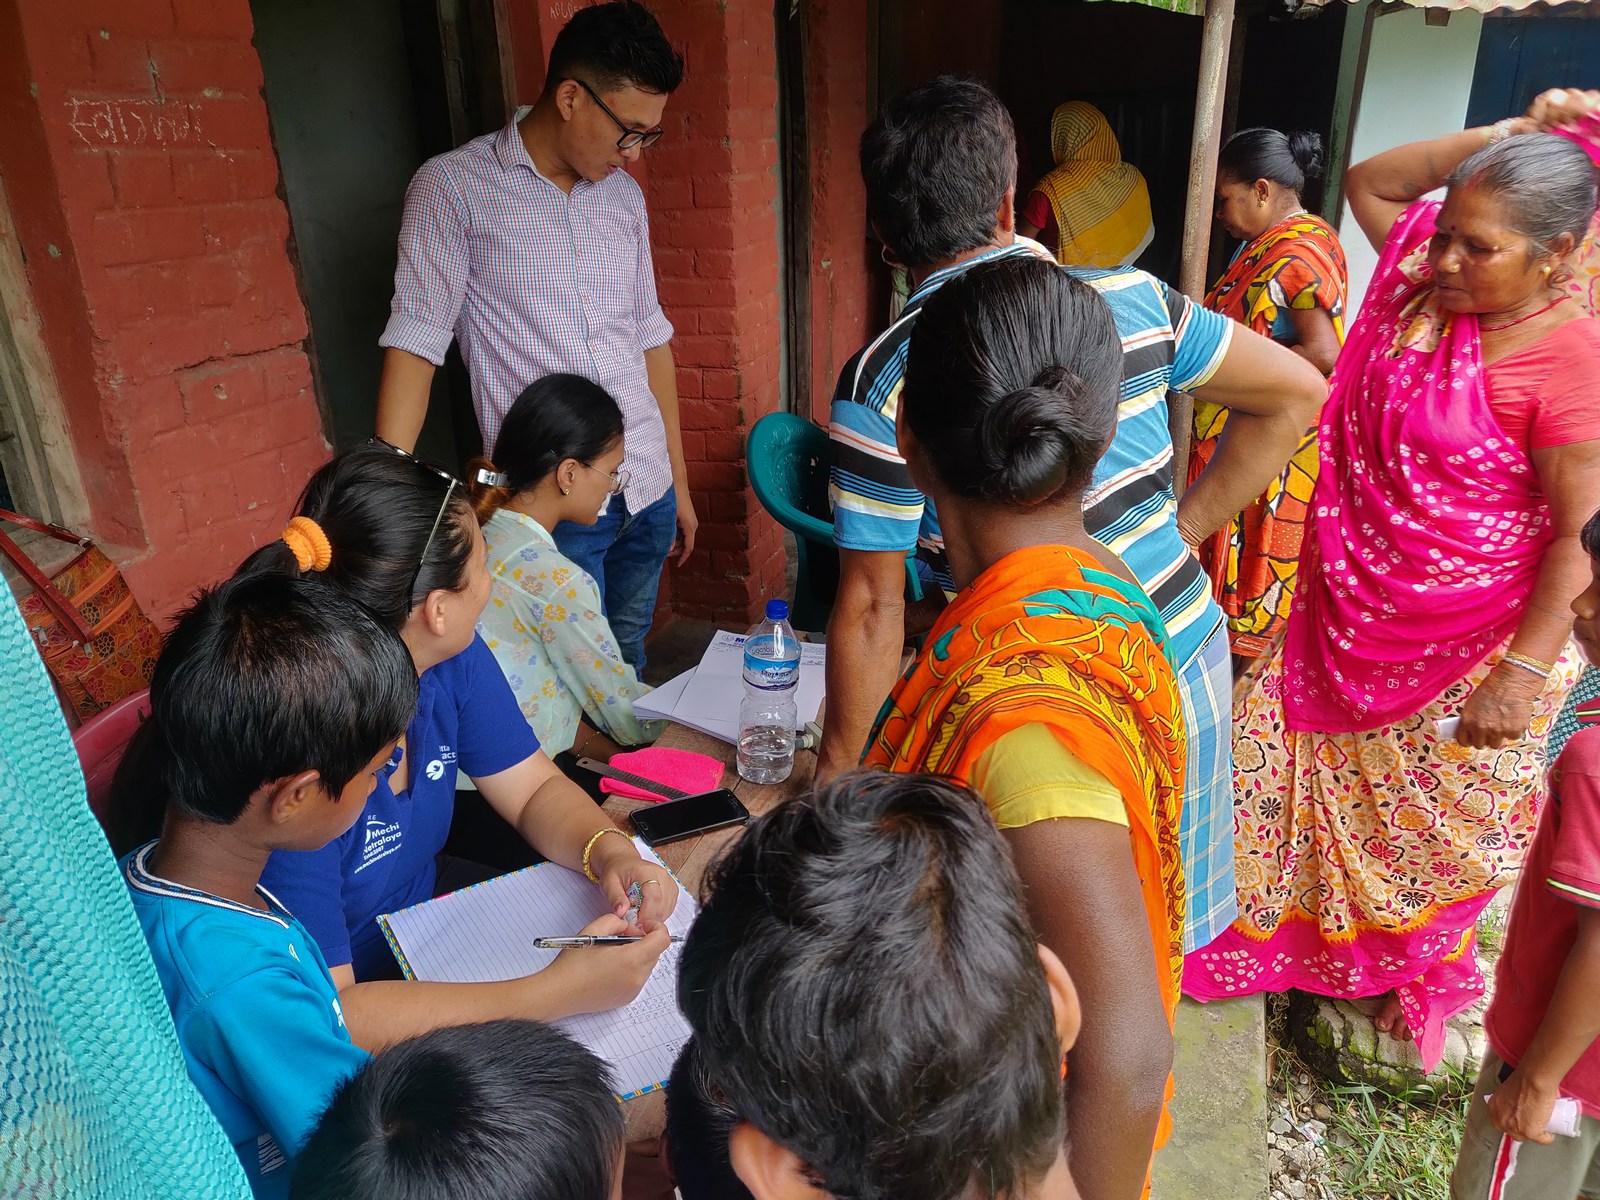 Free-Health-Camp-Eye-Screening-at-Gwala-Basti-Mechinagar-15-Jhapa-Nepal-Rotary-Club-of-Kakarvitta-19